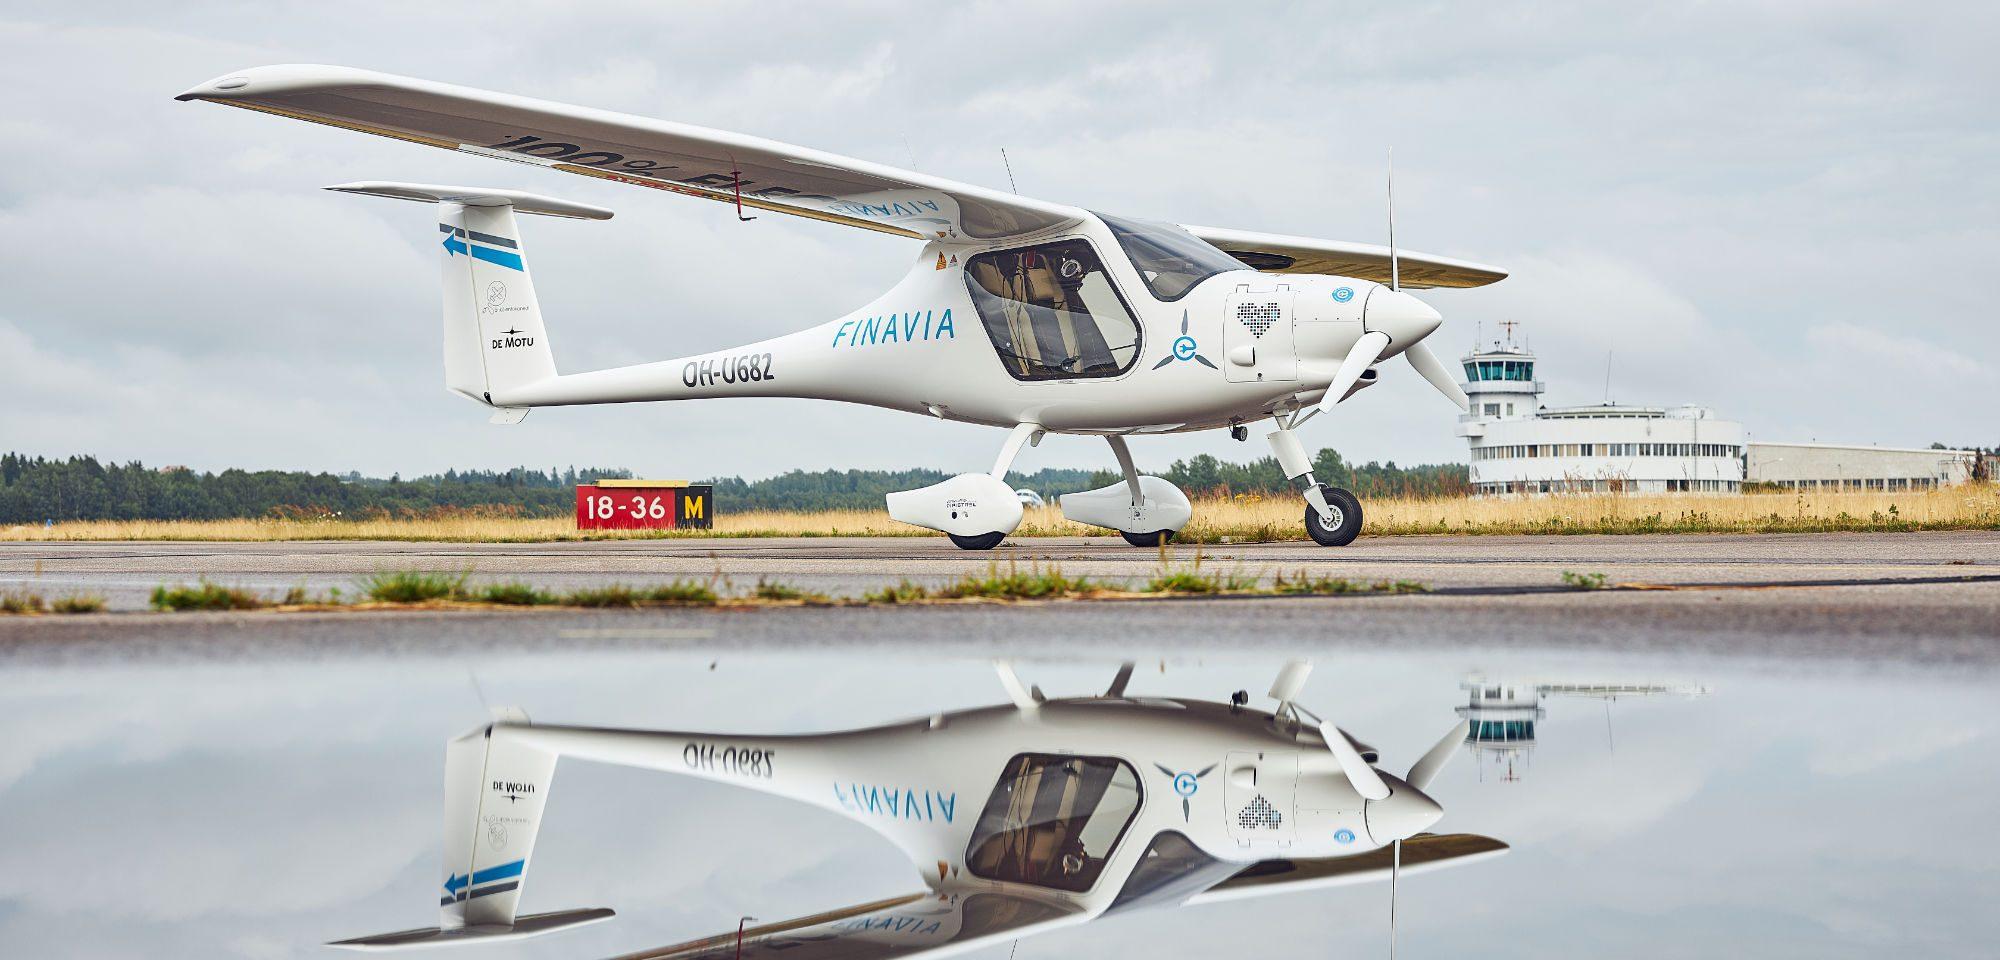 Helsinki Electric Aviation Association